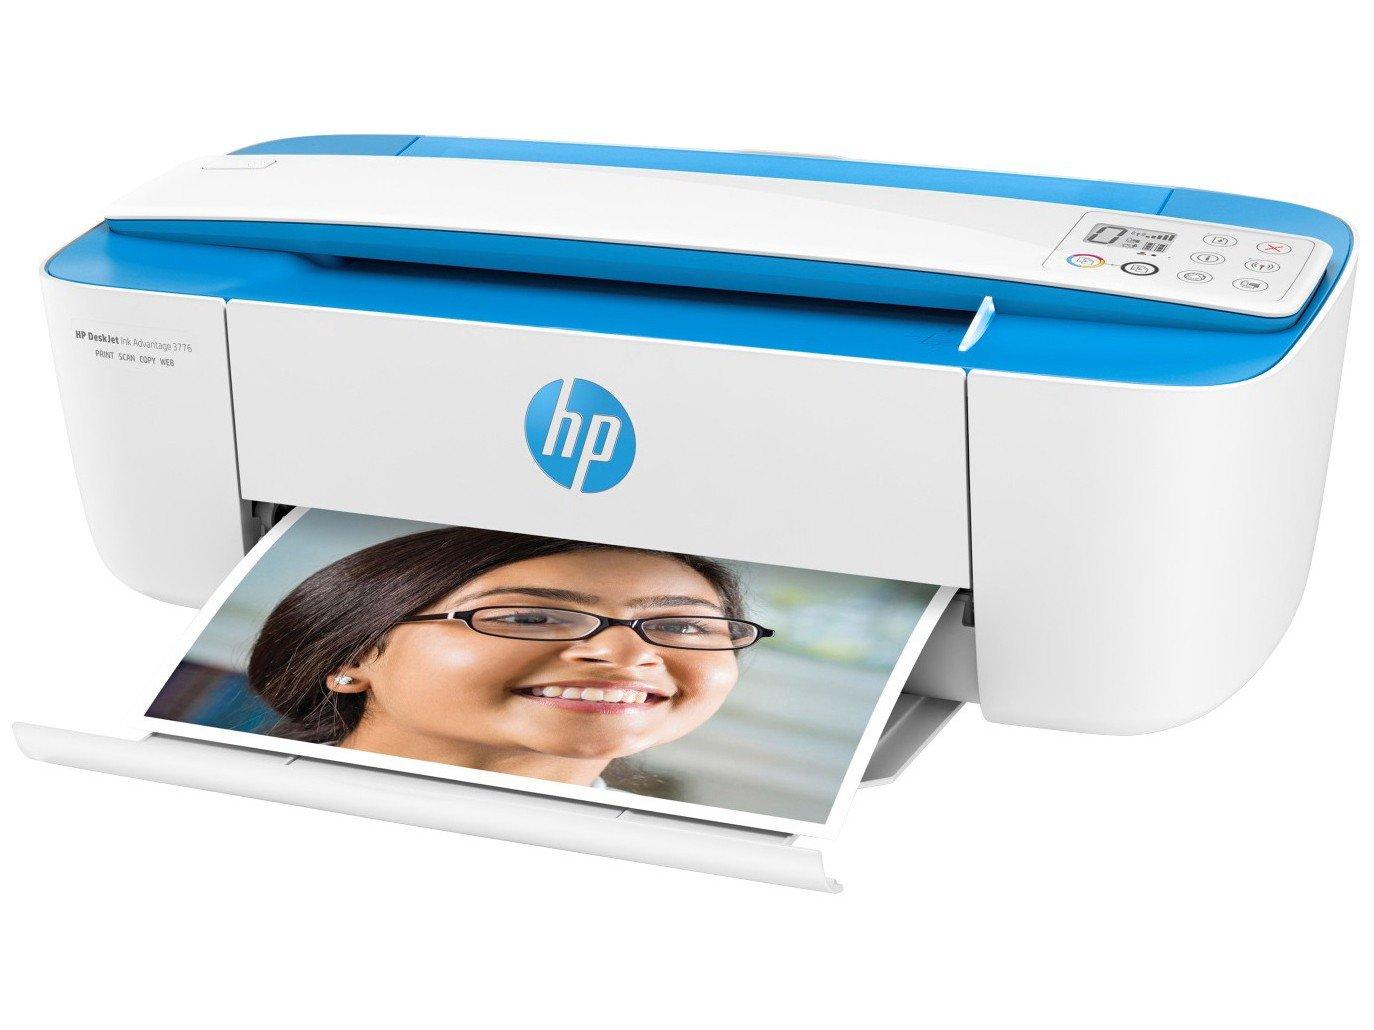 Foto 3 - Multifuncional HP DeskJet Ink Advantage 3776 - Jato de Tinta Display LCD Wi-Fi